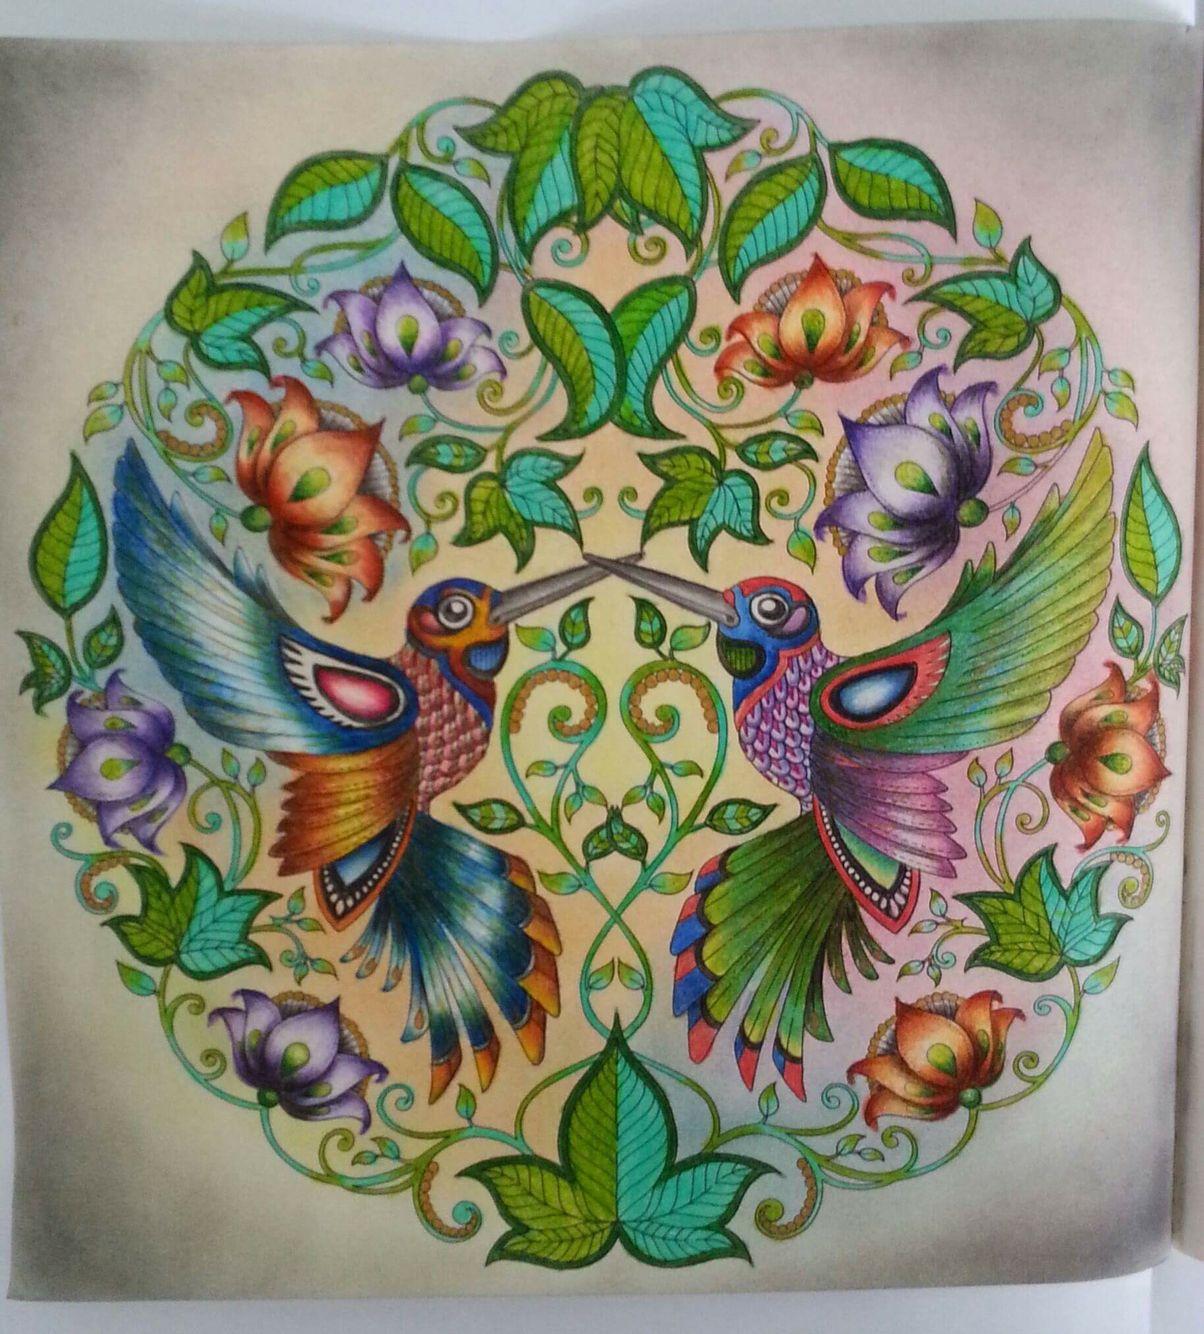 Humming birds secret garden beija flores jardim secreto for El jardin secreto johanna basford